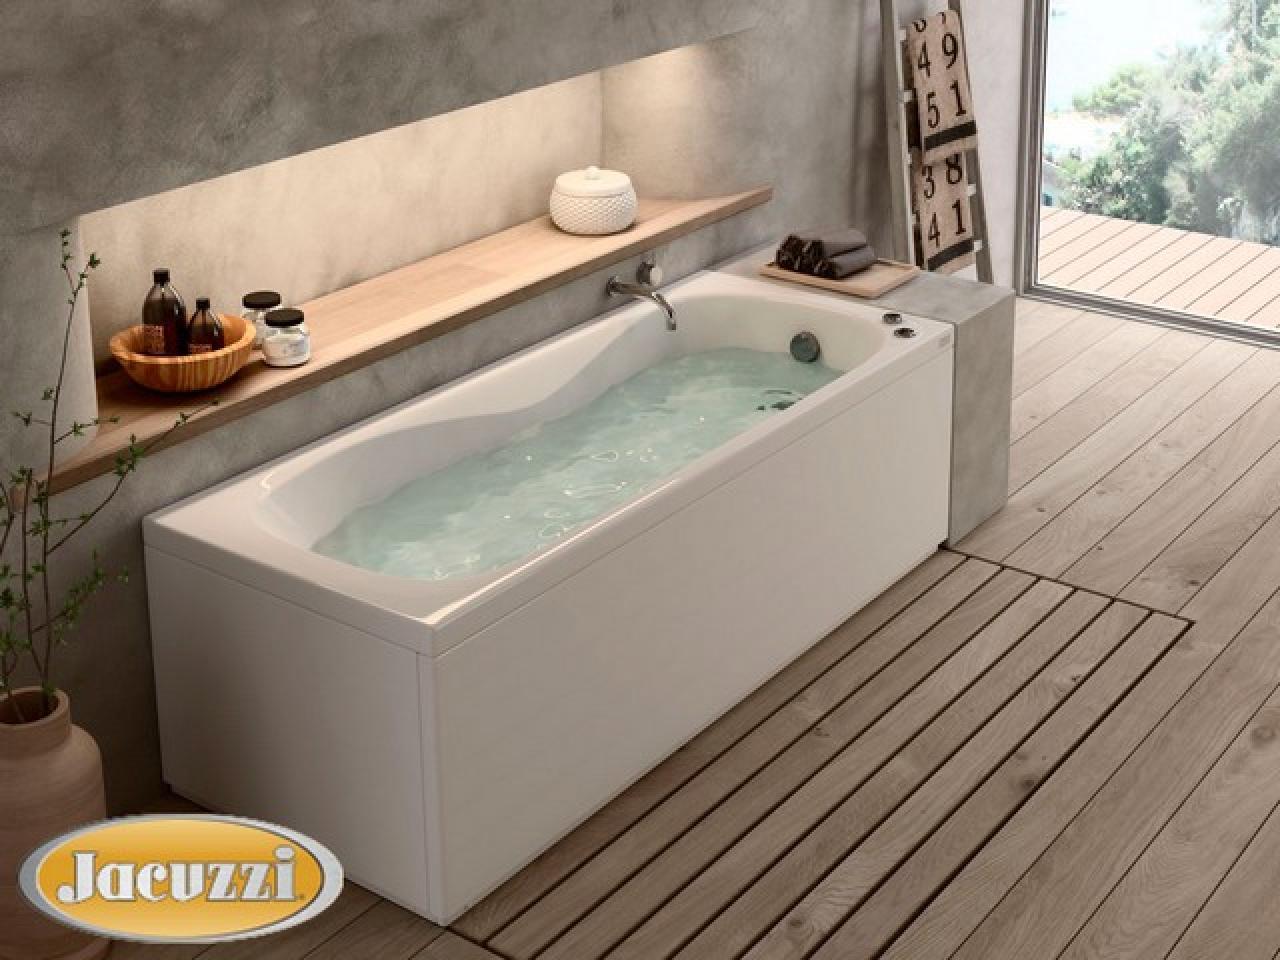 vasca Jacuzzi Soho, offerta outlet Vicenza | Fratelli Pellizzari